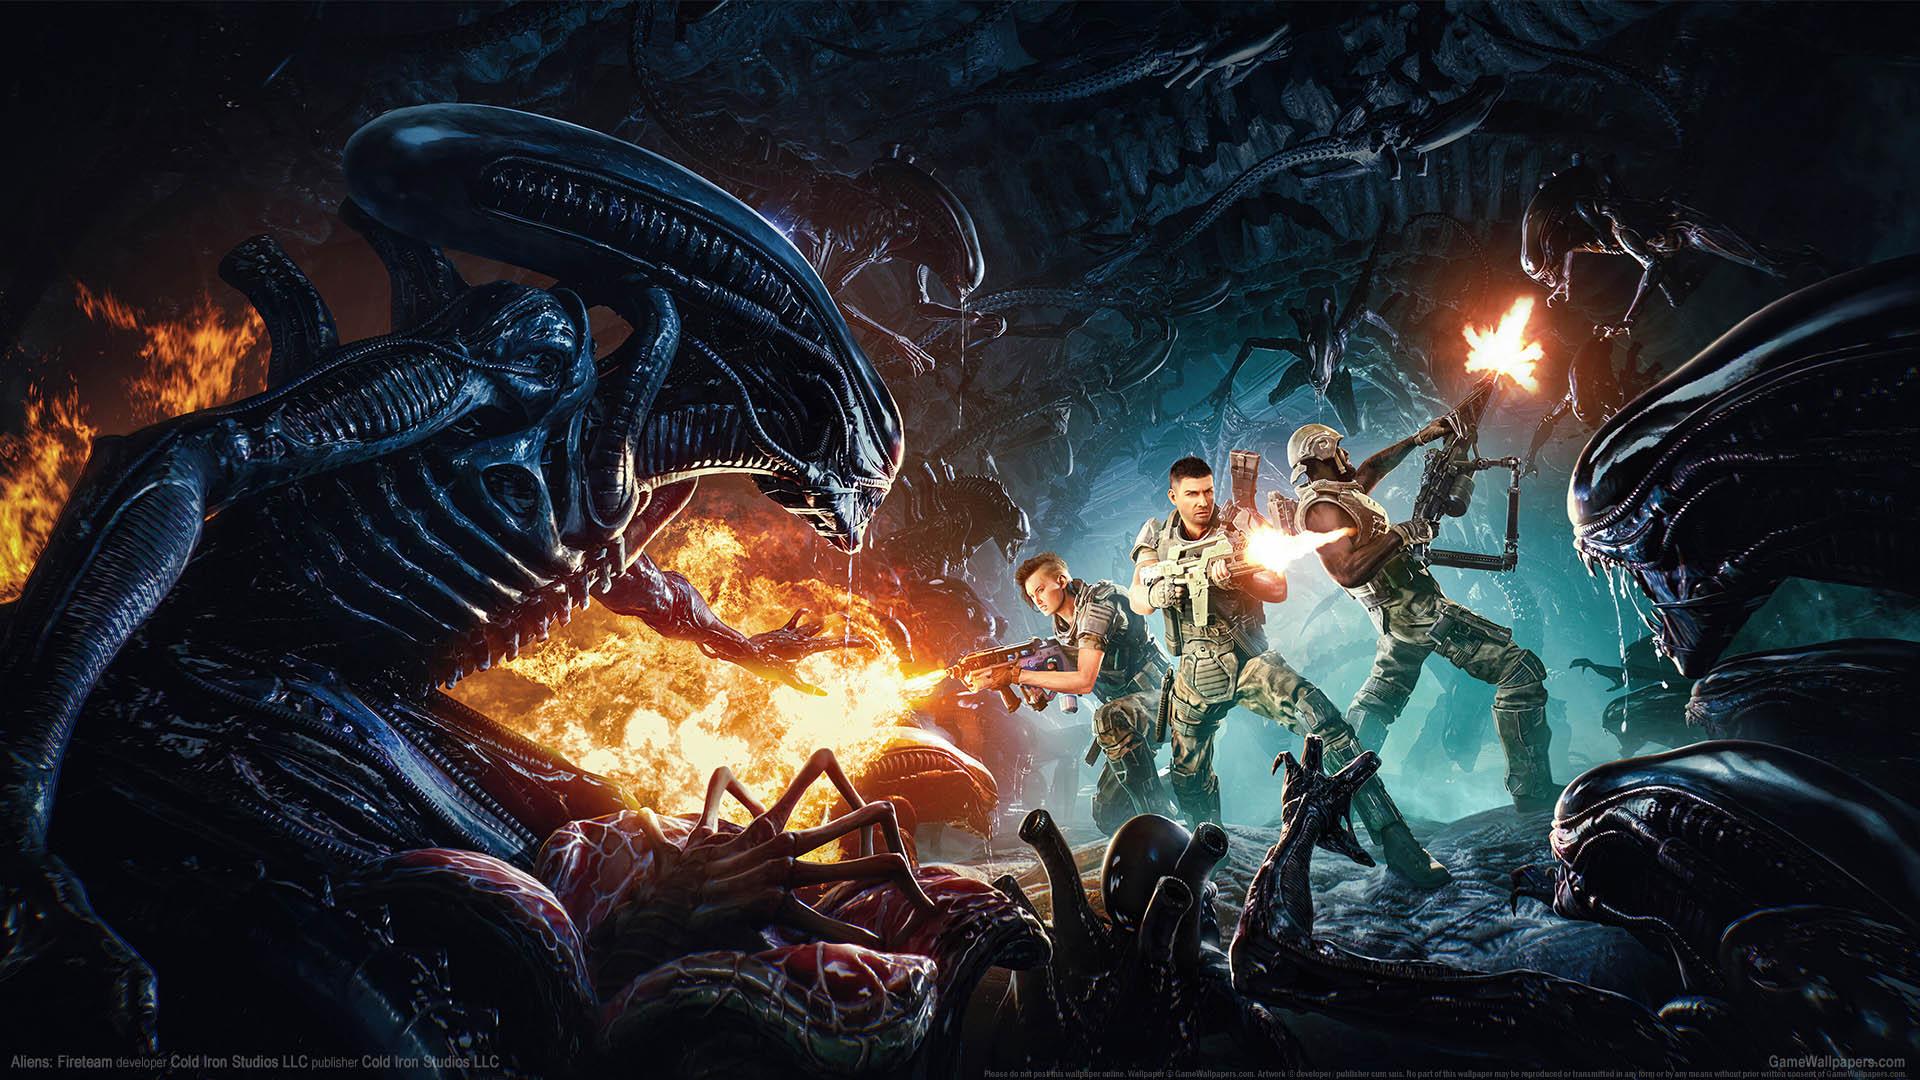 Aliens: Fireteam wallpaper 01 1920x1080